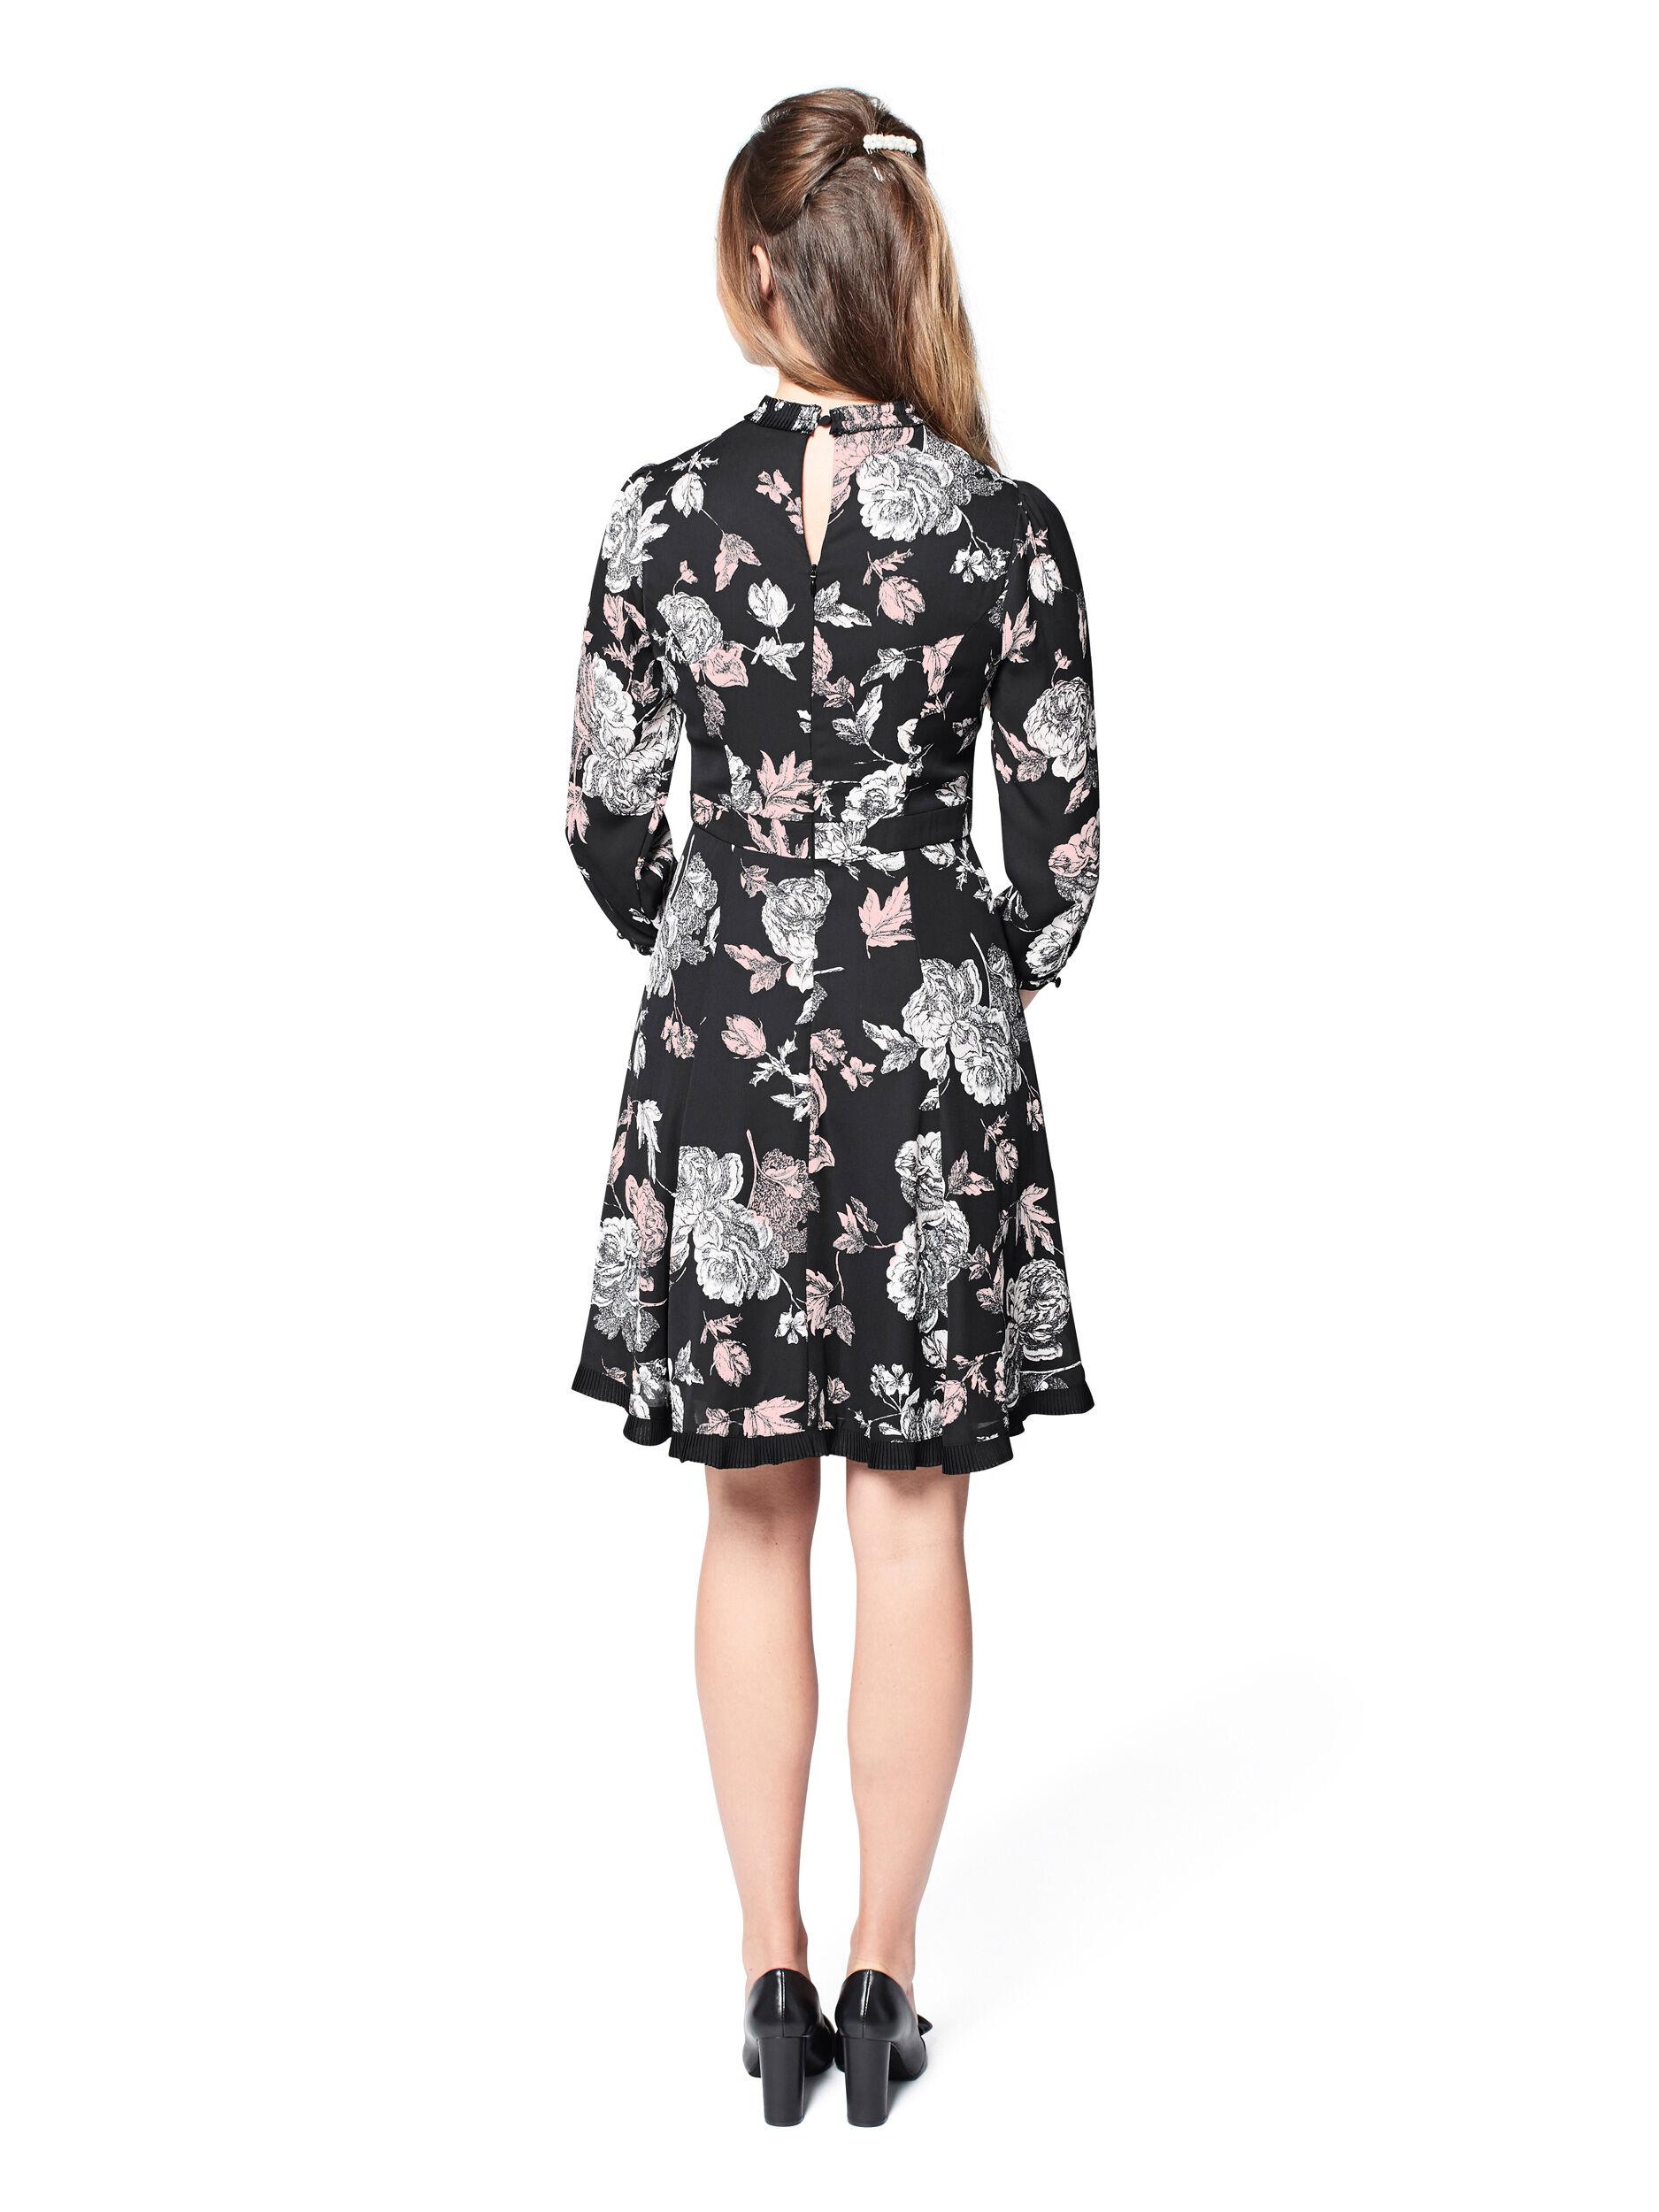 Florenta Dress